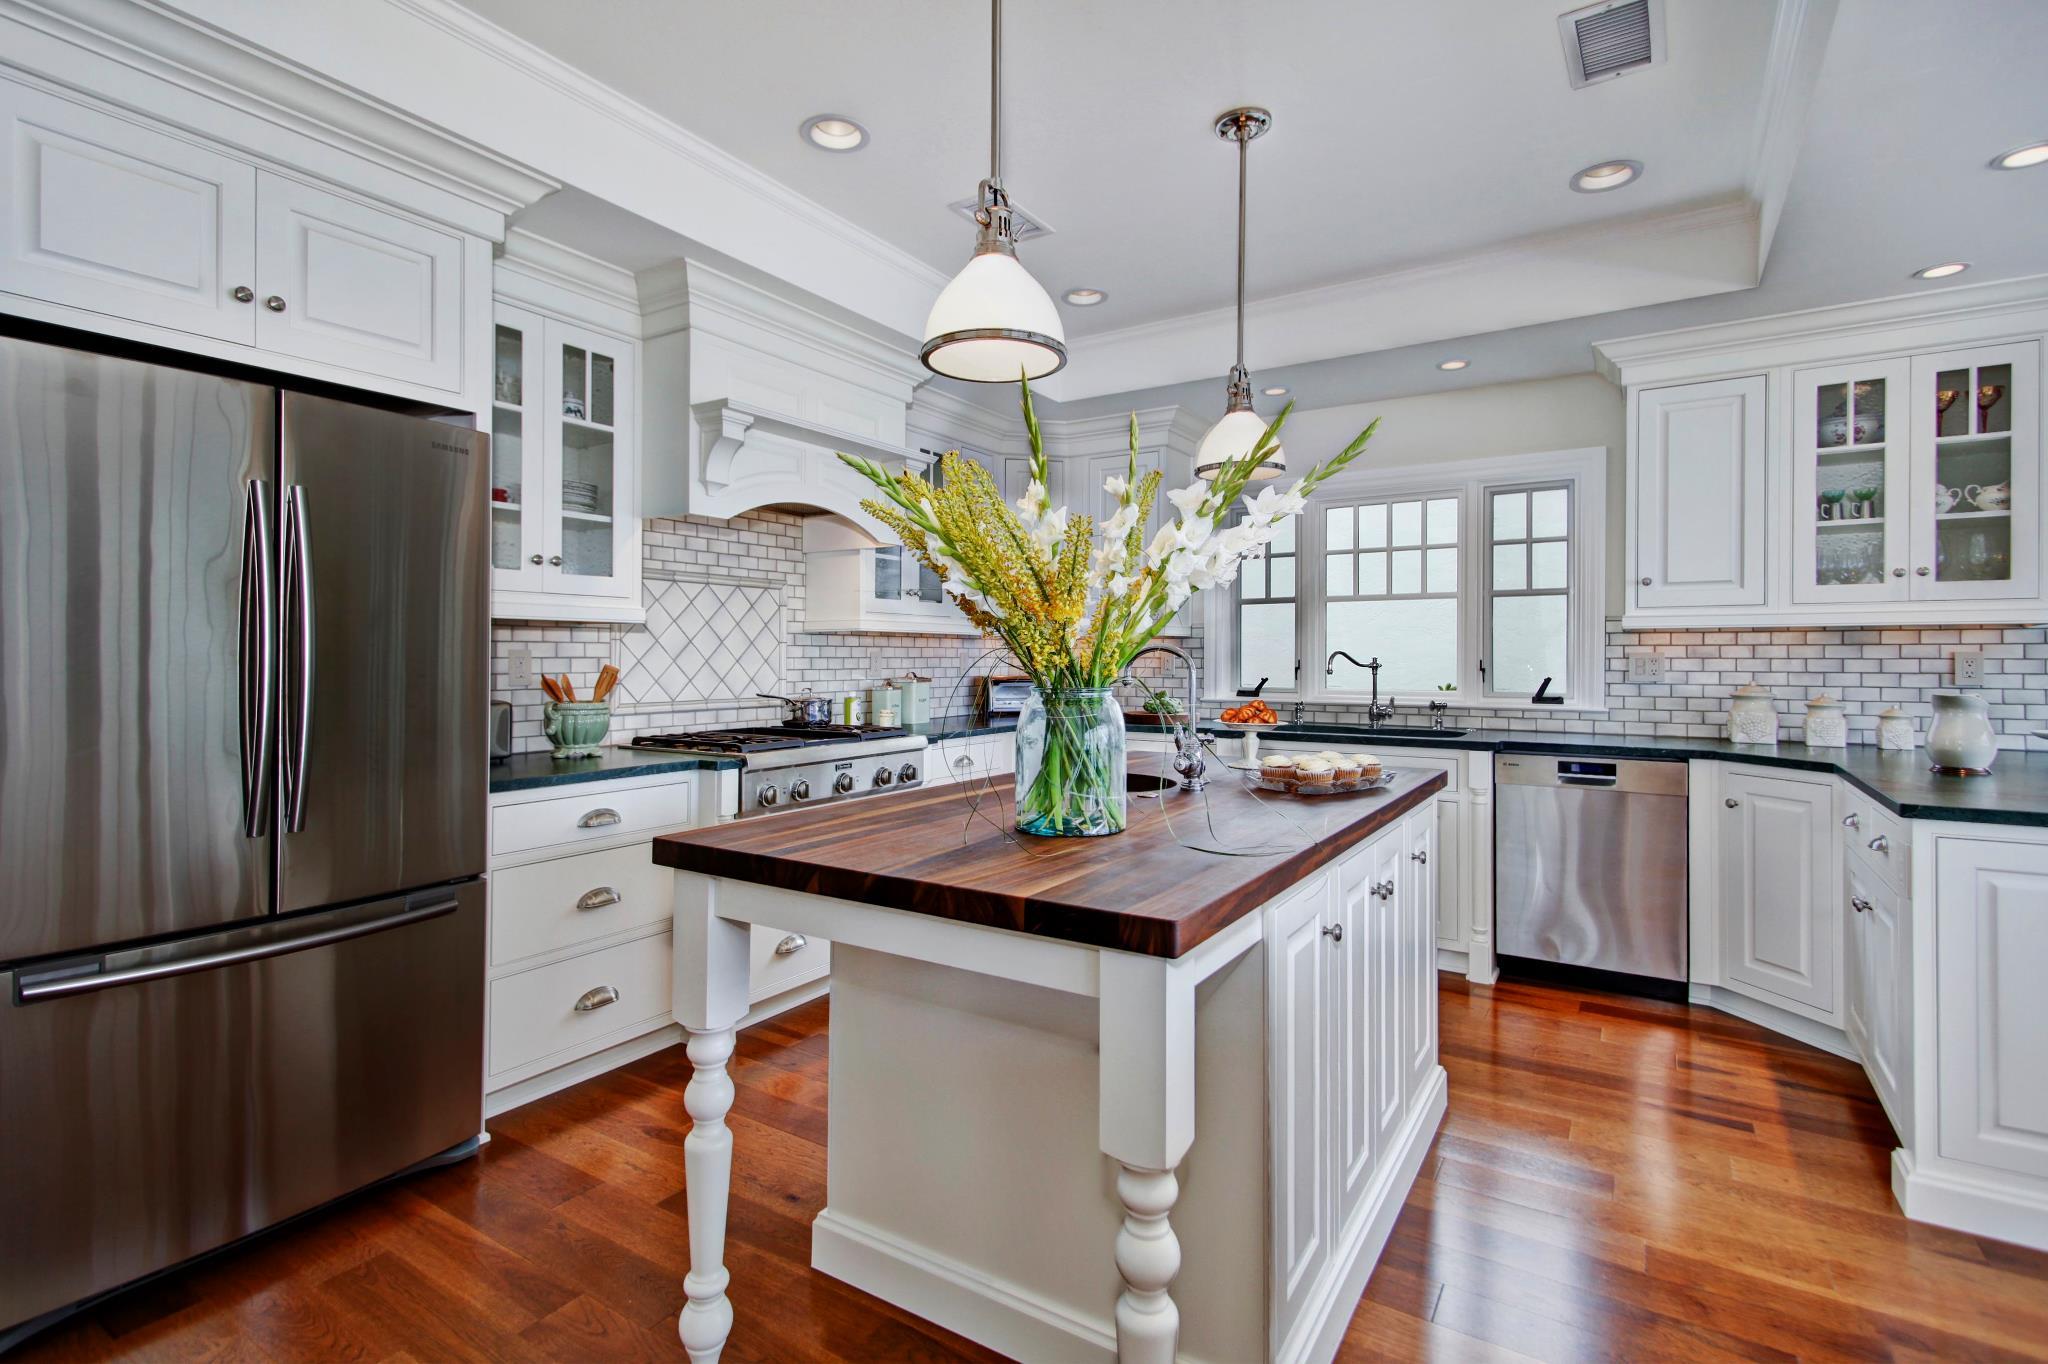 brakur colonial kitchen sink Dover NH Kitchen Cabinets